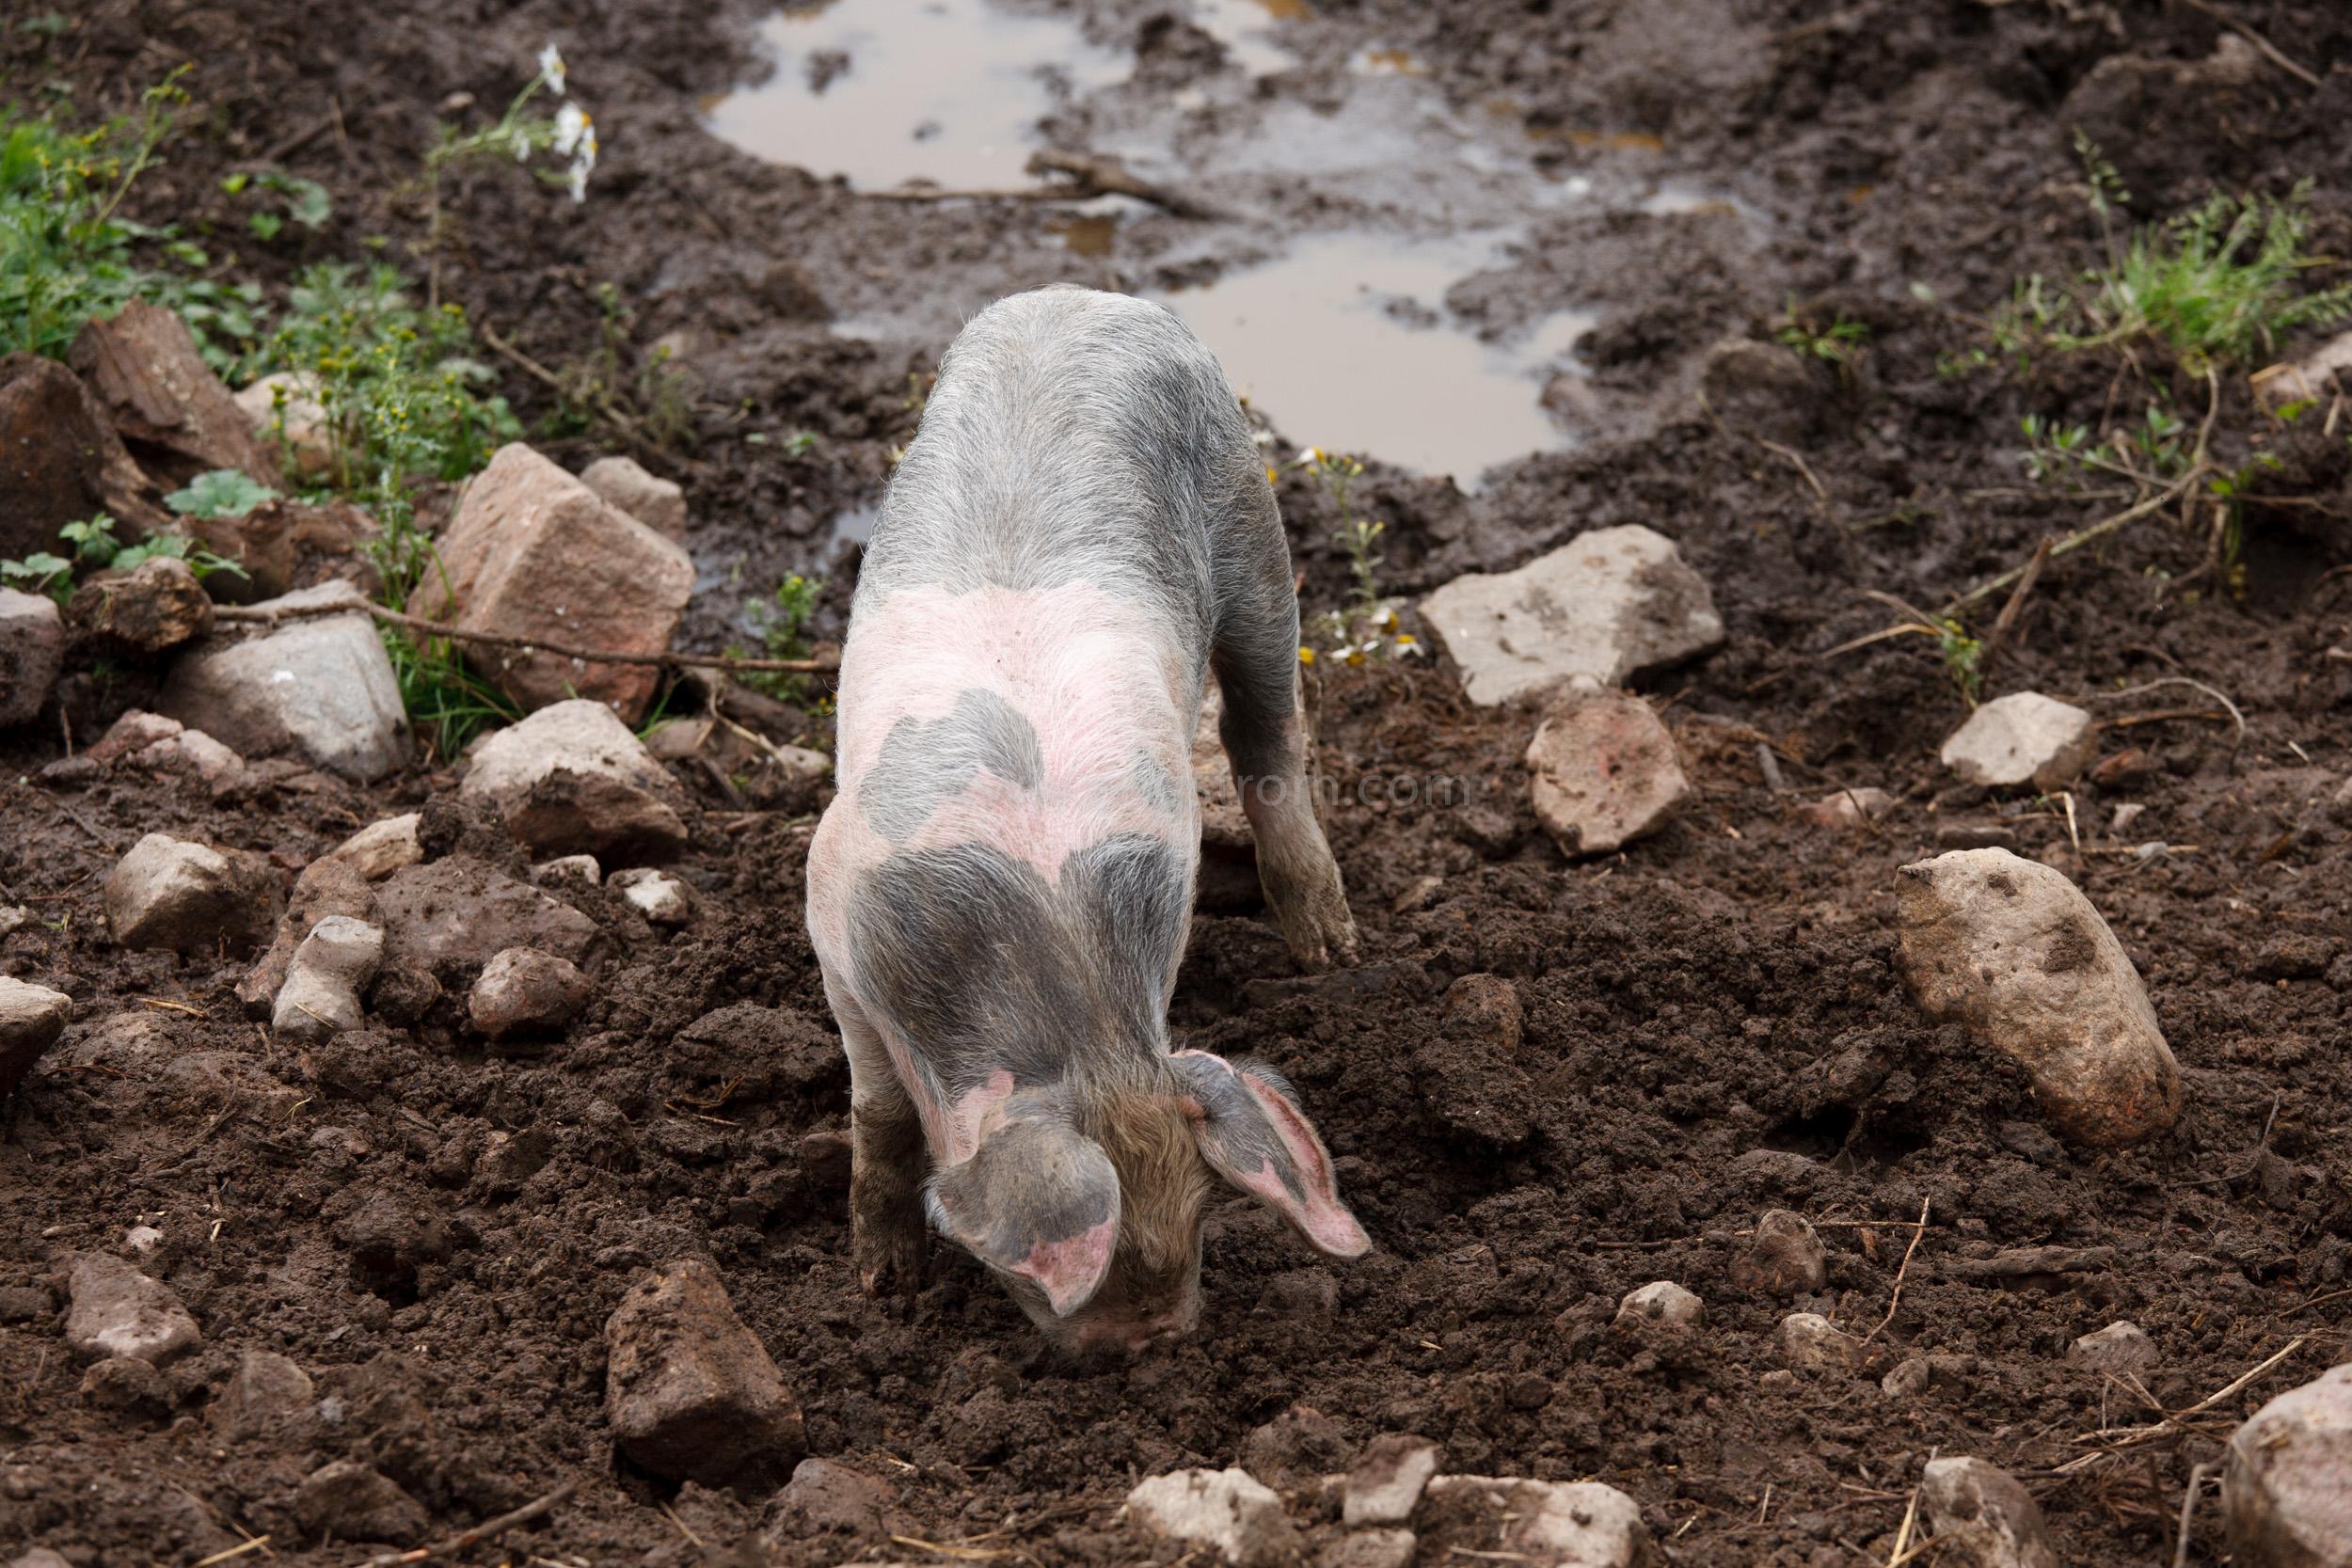 JE_20110708-083344, Bökande ekologisk gris, Jonas Engström